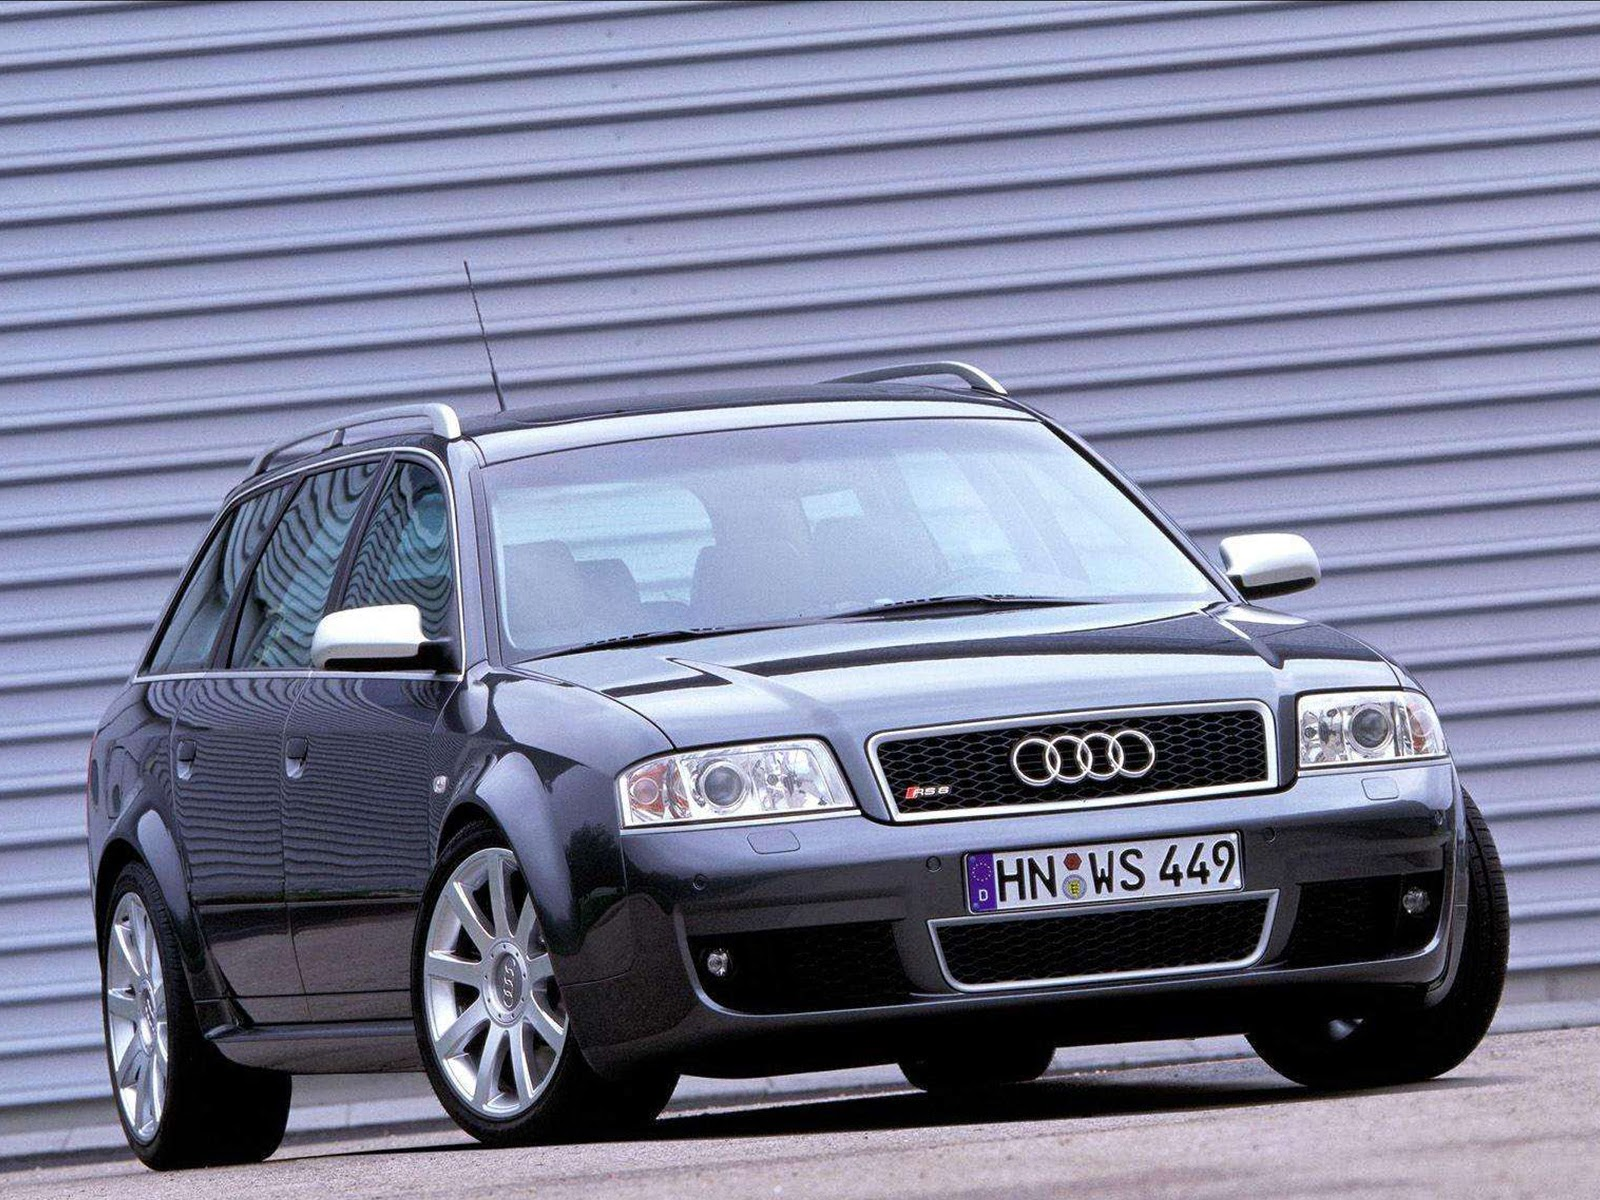 Audi RS 6 I (C5) 2002 - 2004 Sedan #2